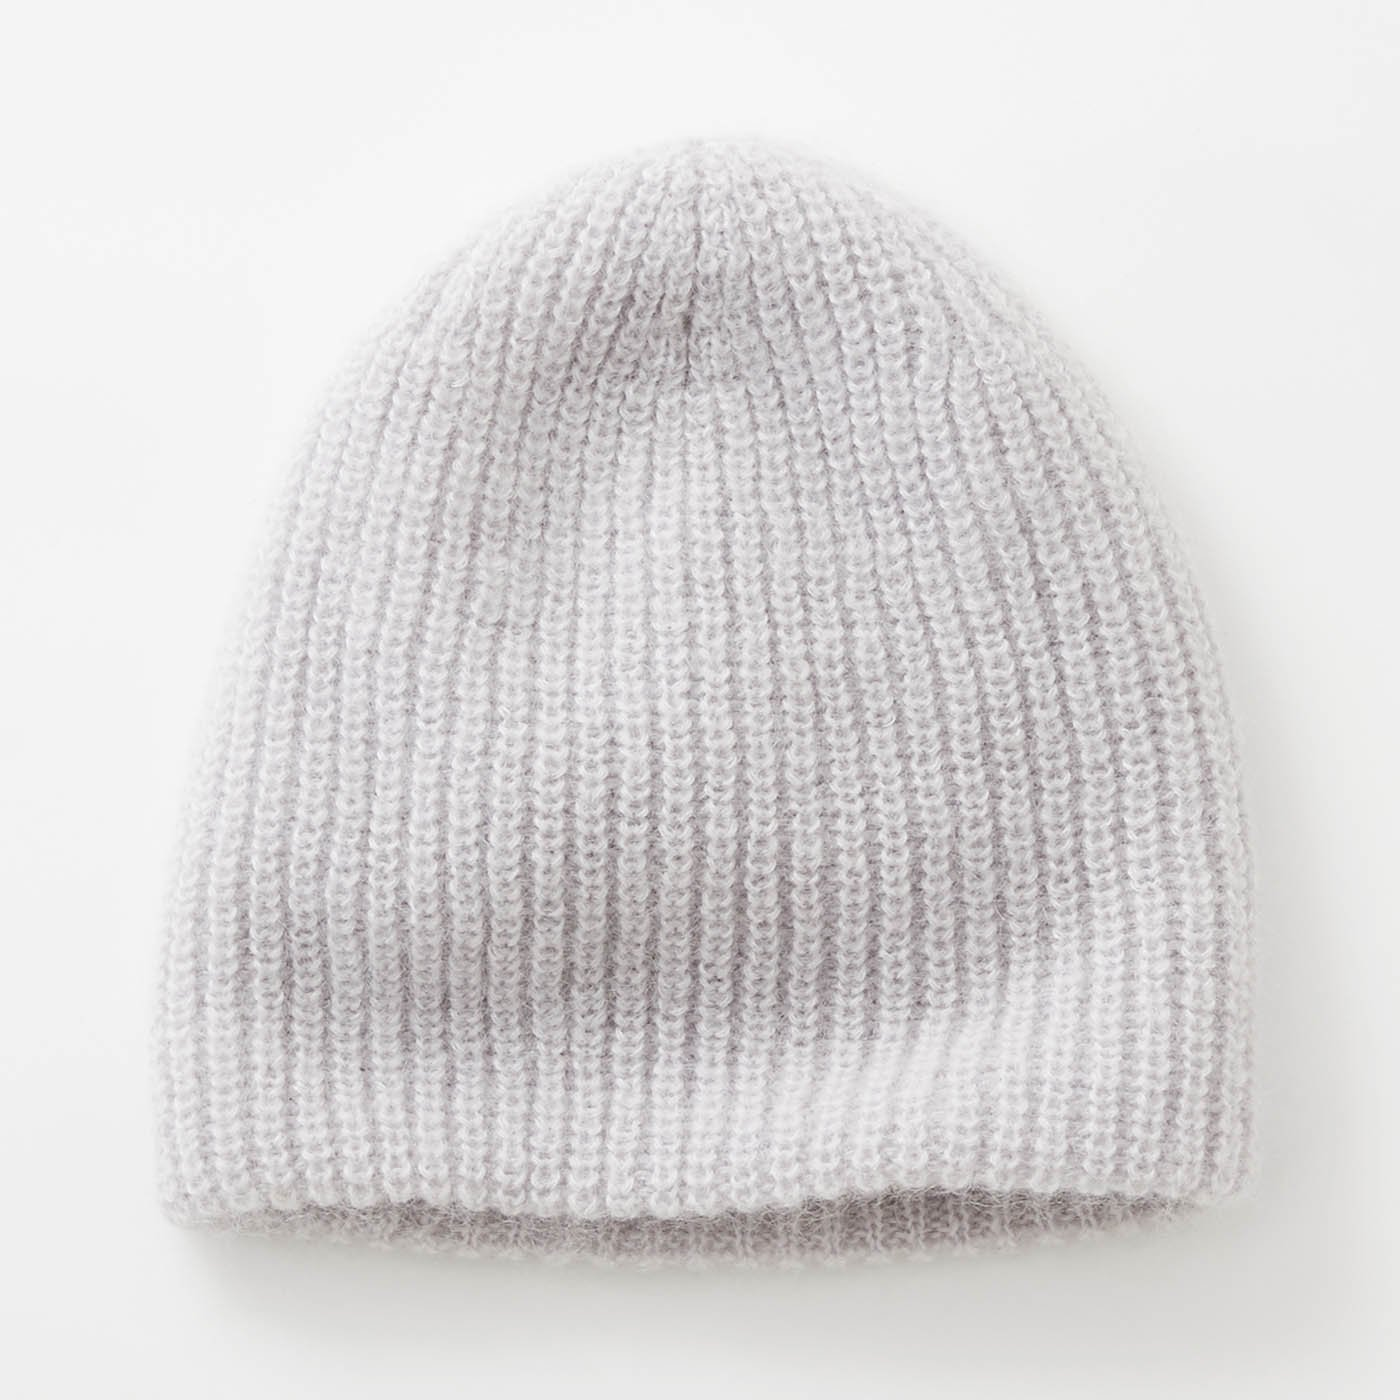 odds モヘアニット帽〈ライトグレー〉